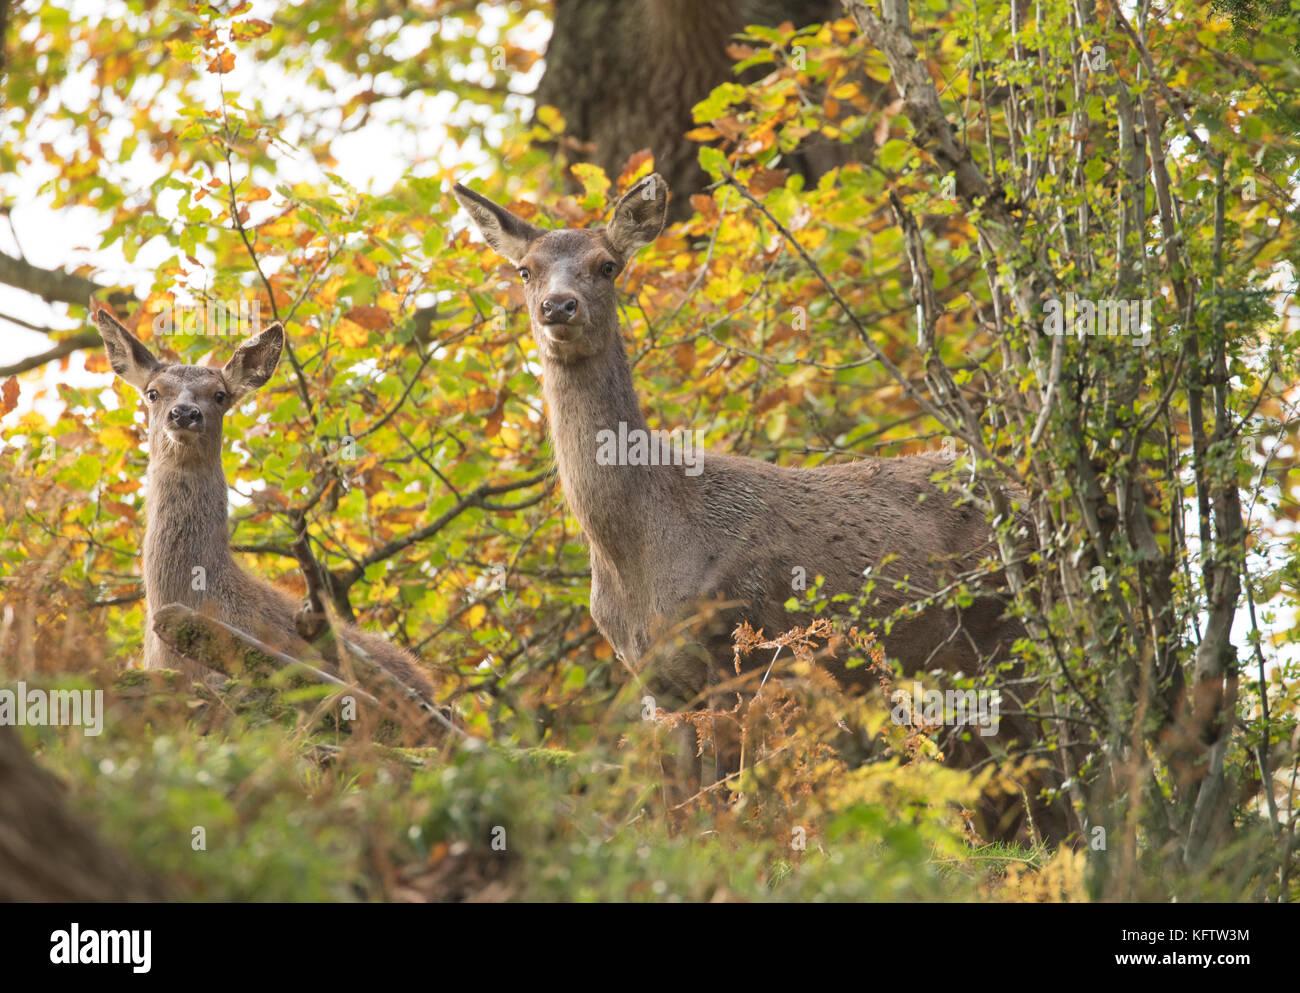 Red deer Hinden auf dem Alarm in Wäldern, Wales, UK. Stockbild